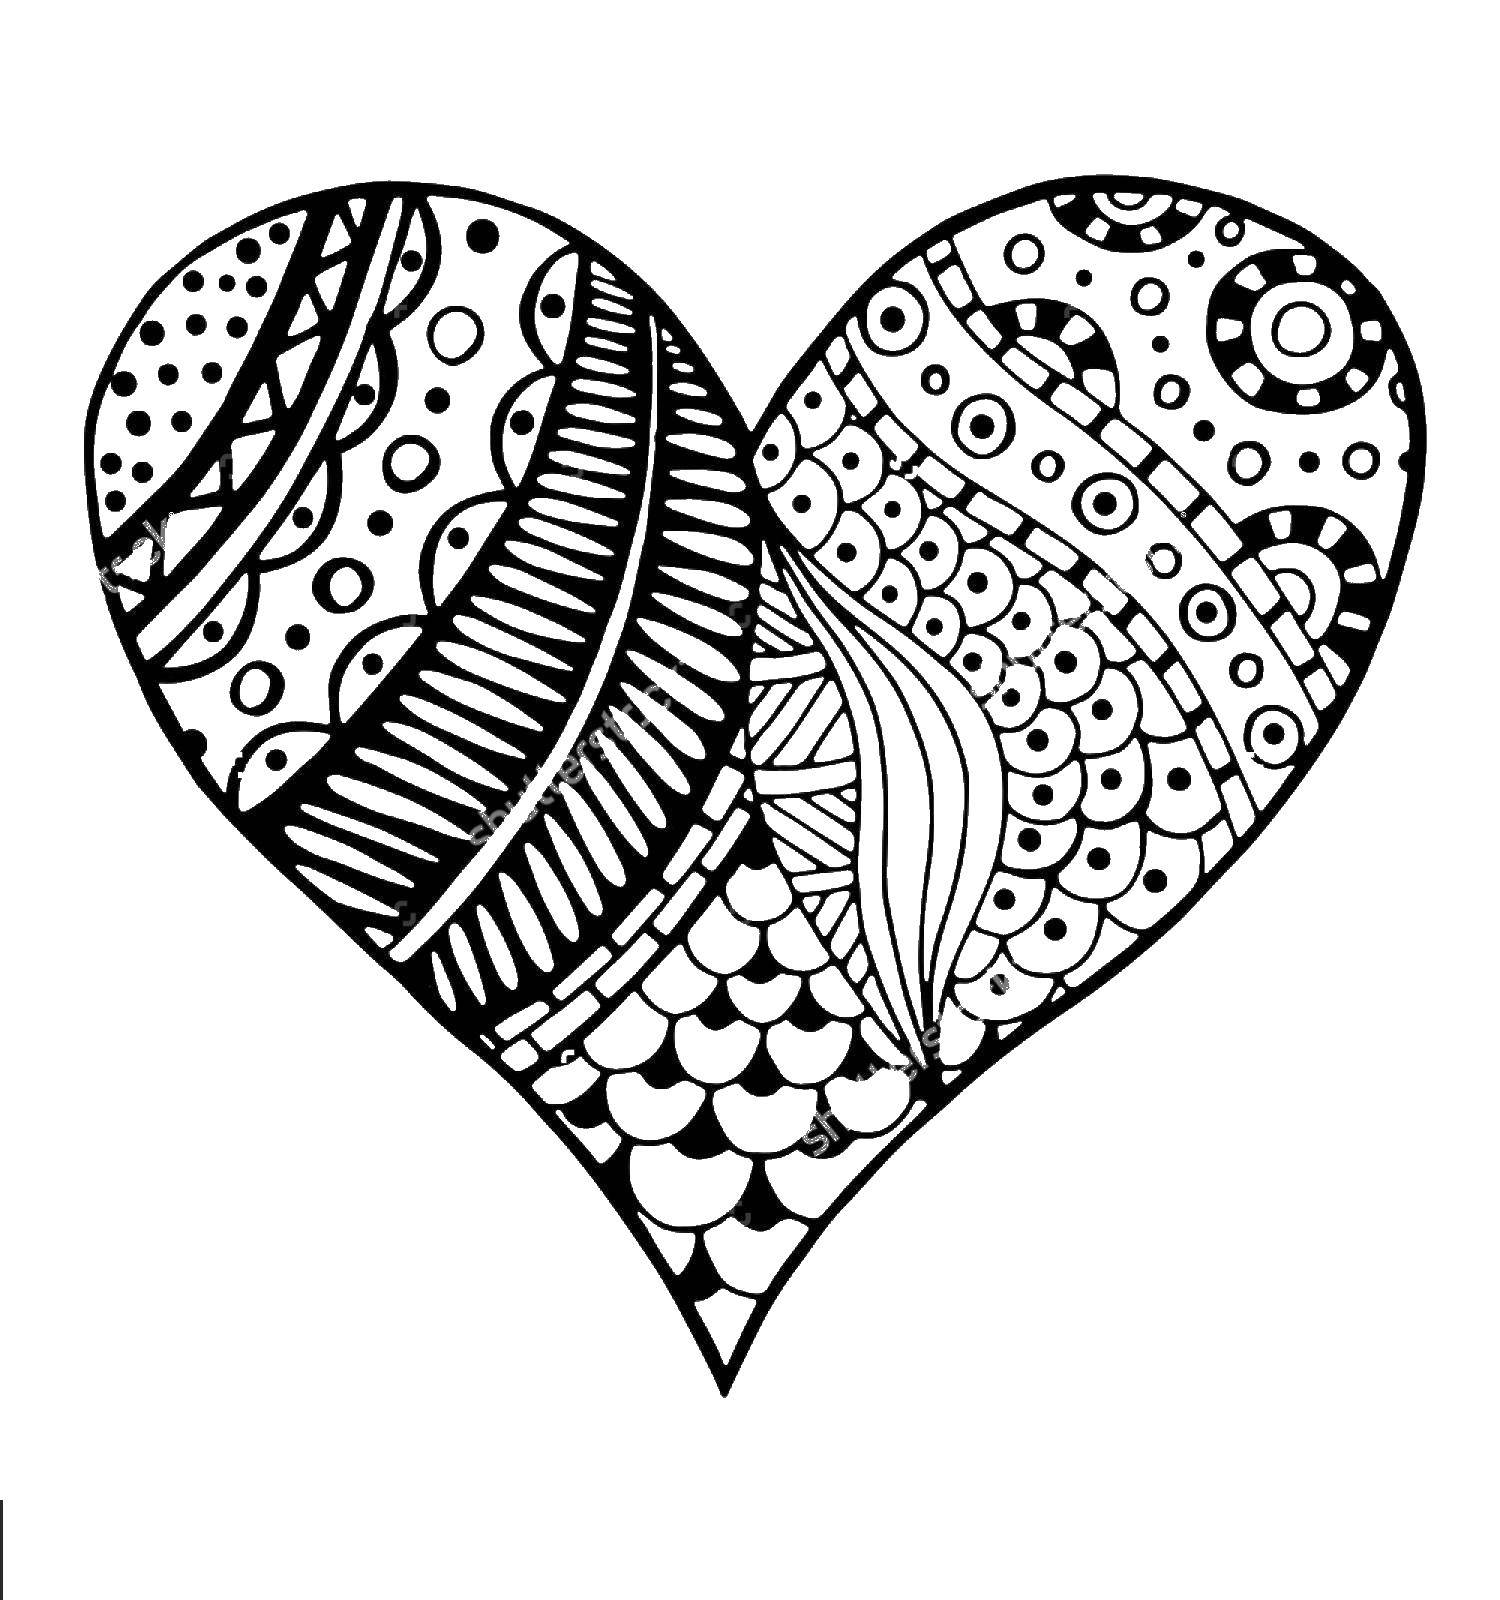 Название: Раскраска Красивое сердце с узорами. Категория: Я тебя люблю. Теги: сердце.